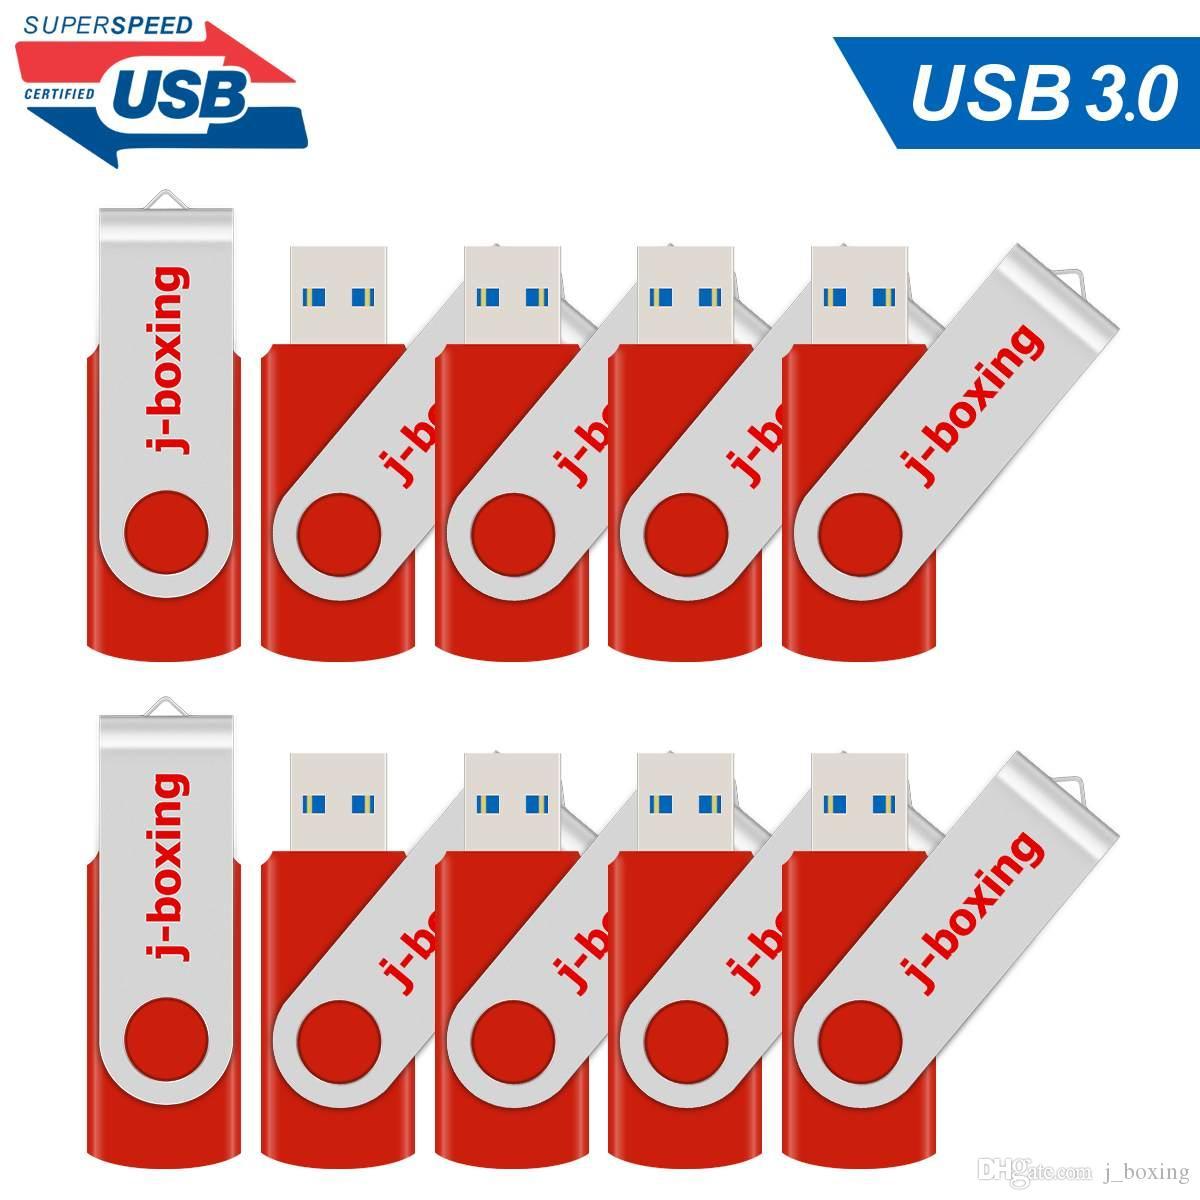 10X Red 16GB USB 3.0 флэш-накопители металла Вращающийся флэш-Pen Drive Thumb Memory Stick достаточно для хранения компьютеров Macbook Tablet Laptop